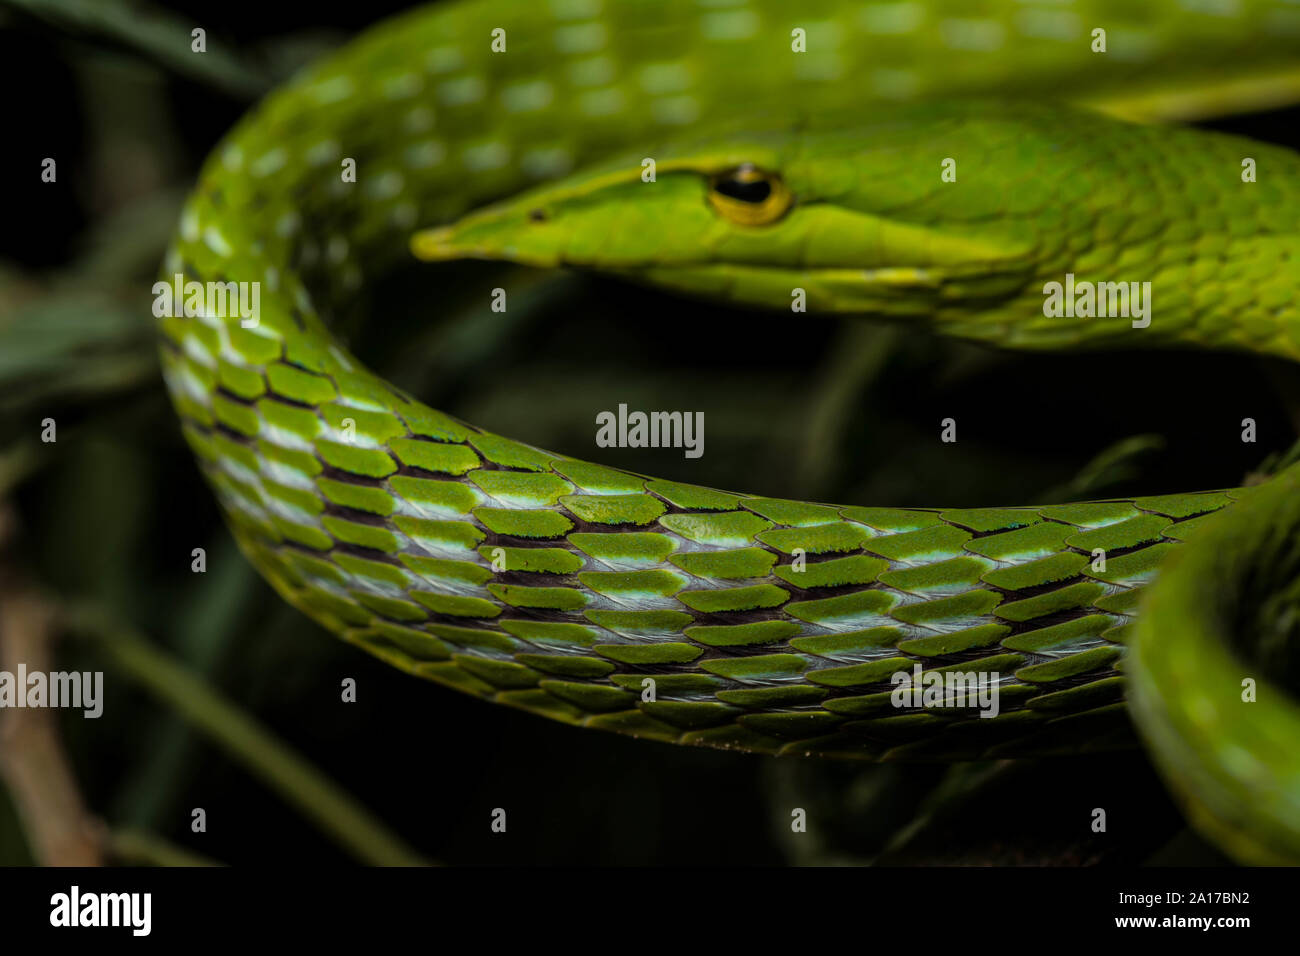 Long-nosed Whipsnake (Ahaetulla nasuta) from Prachuap Khiri Khan Province, Thailand. Stock Photo